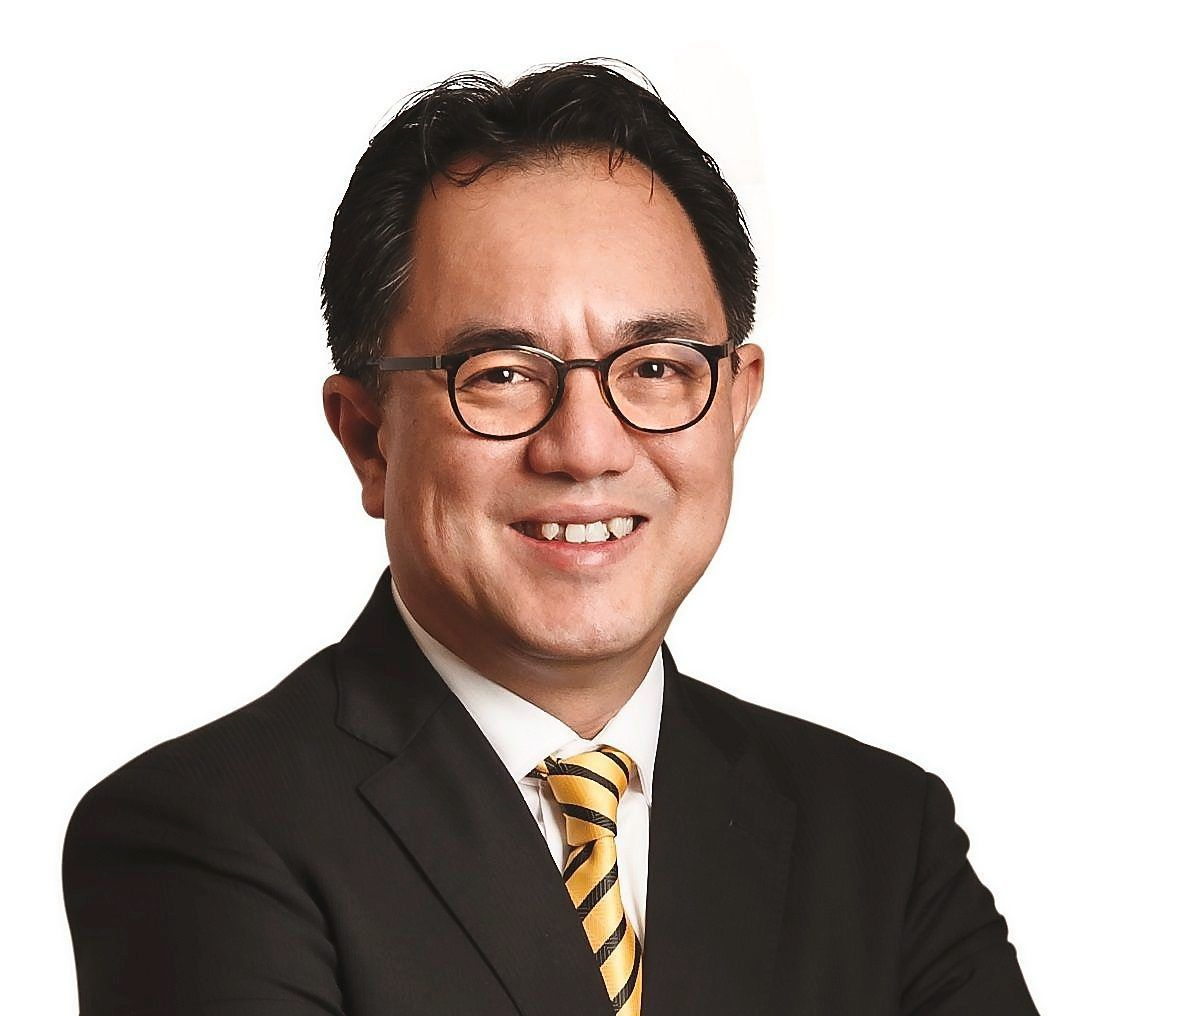 Datuk Abdul Farid Alias, Group President & CEO of Maybank